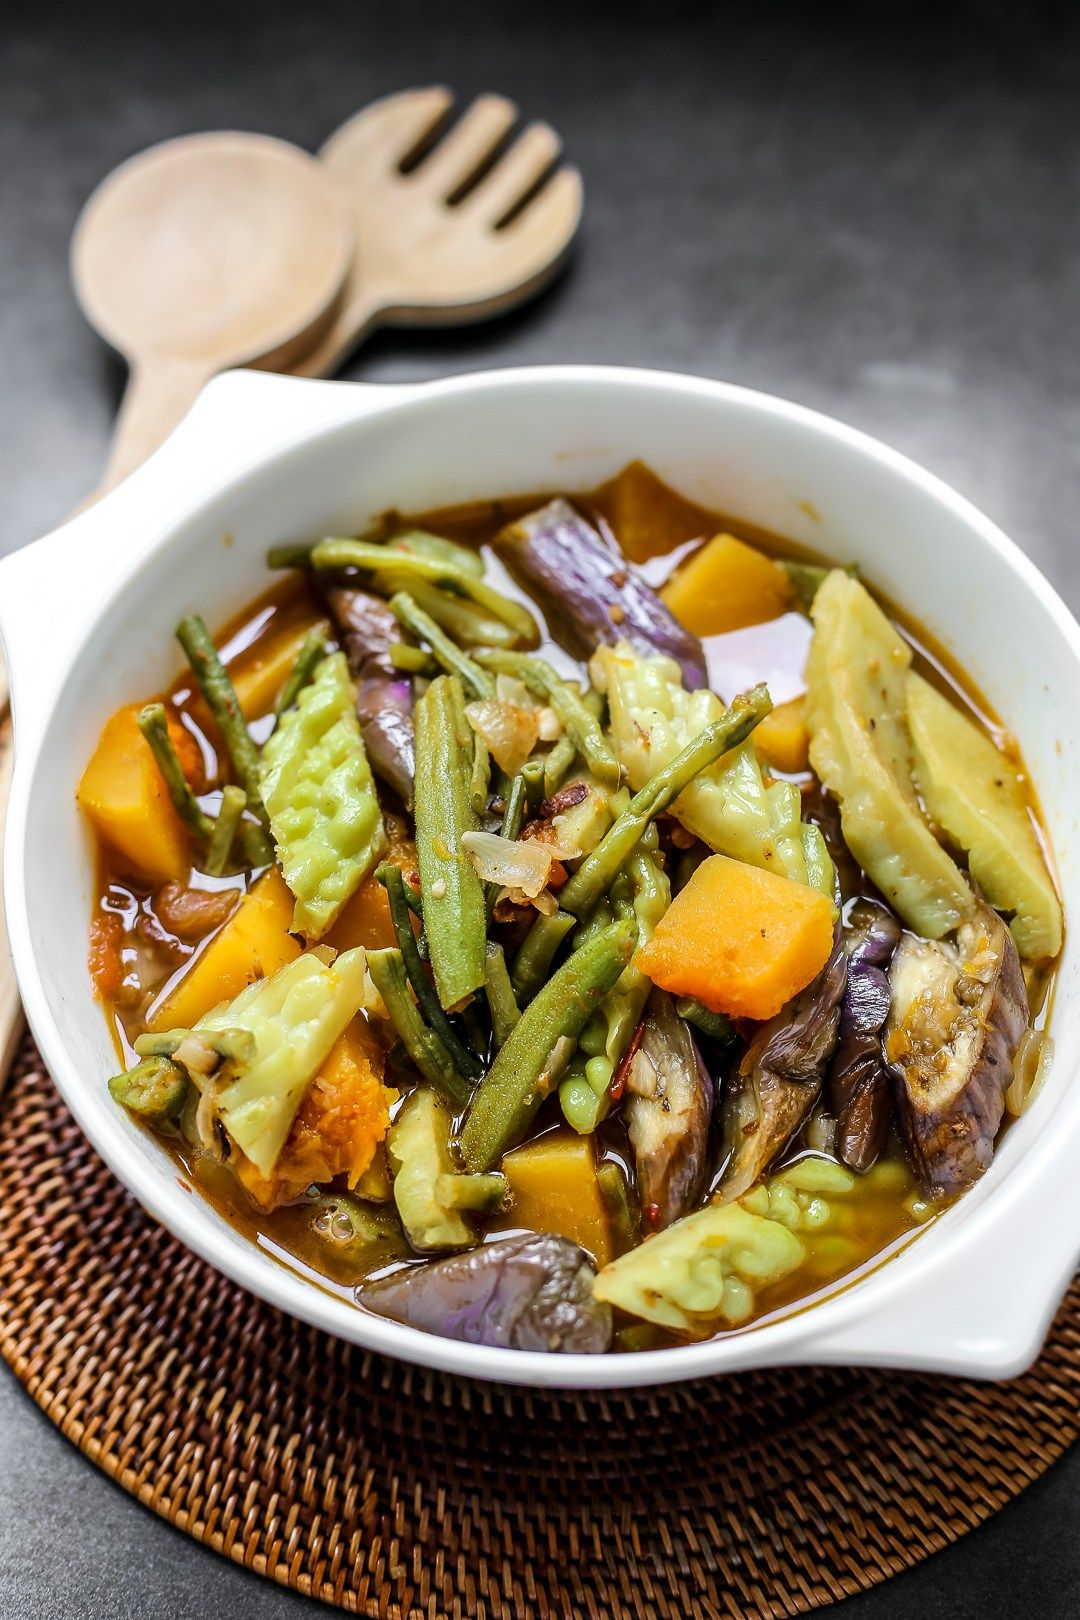 Pinakbet Recipe Recipes with fish sauce, Pinakbet